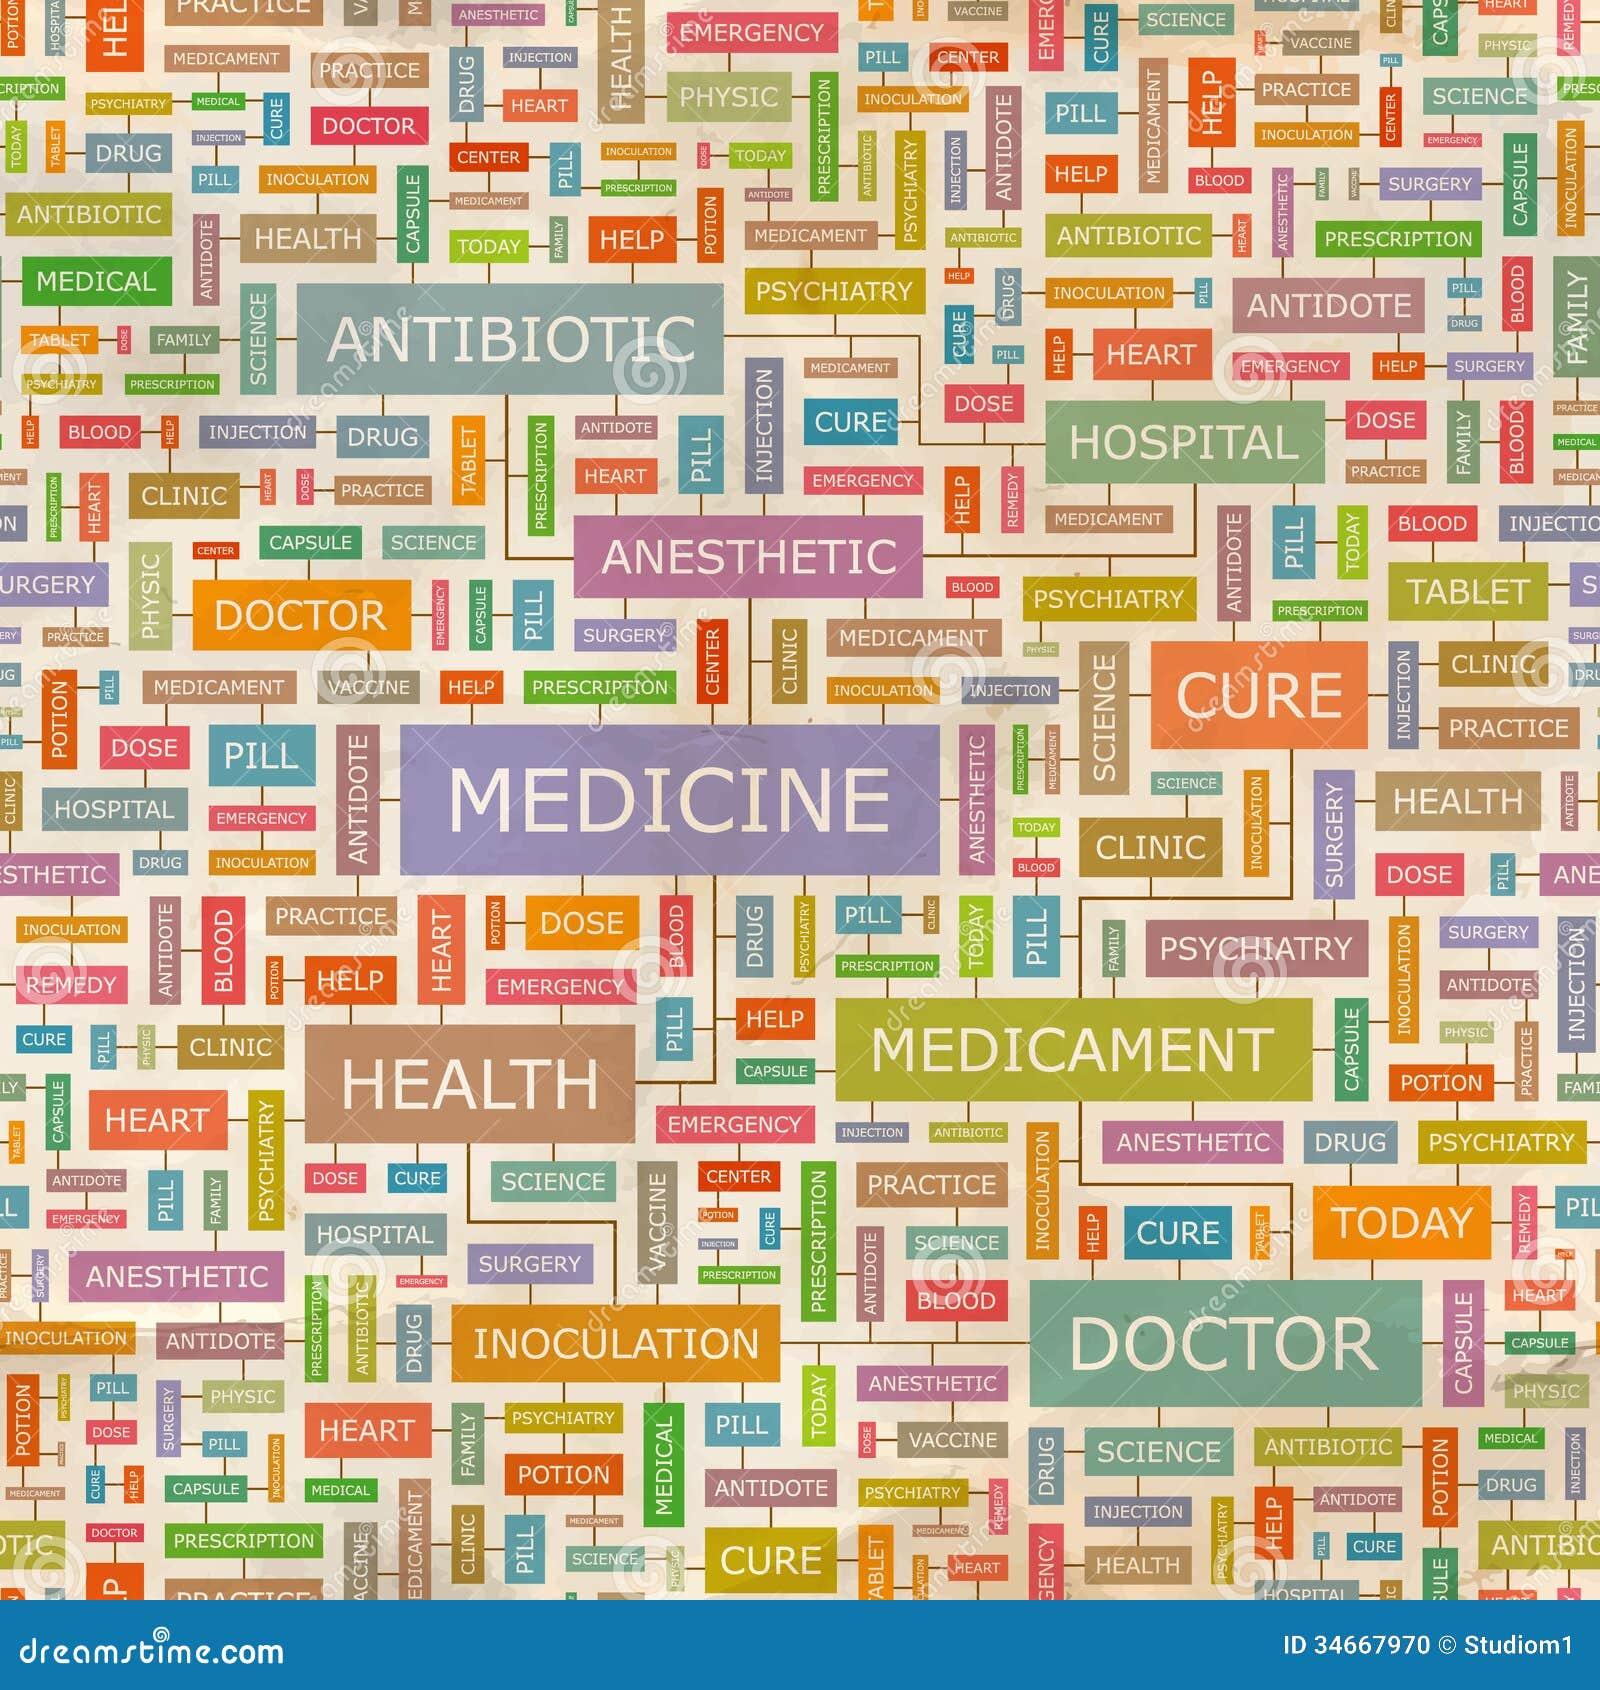 Medicine Stock Photo - Image: 34667970